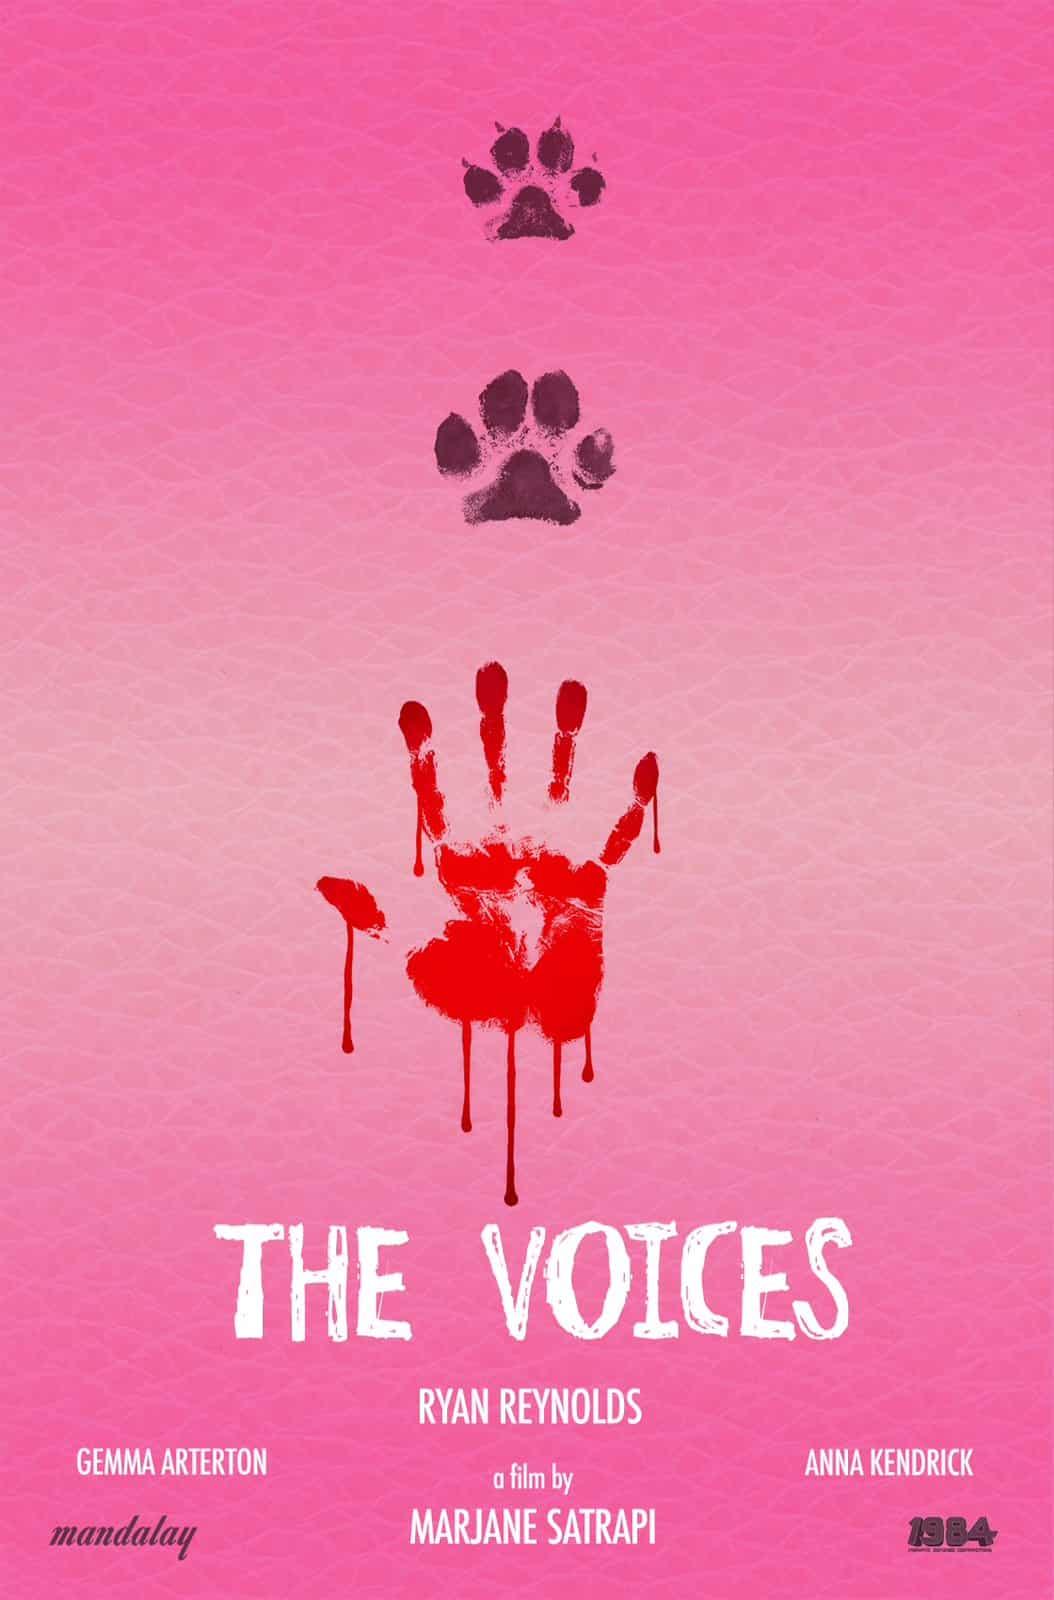 The Voices / Marjane Strapi